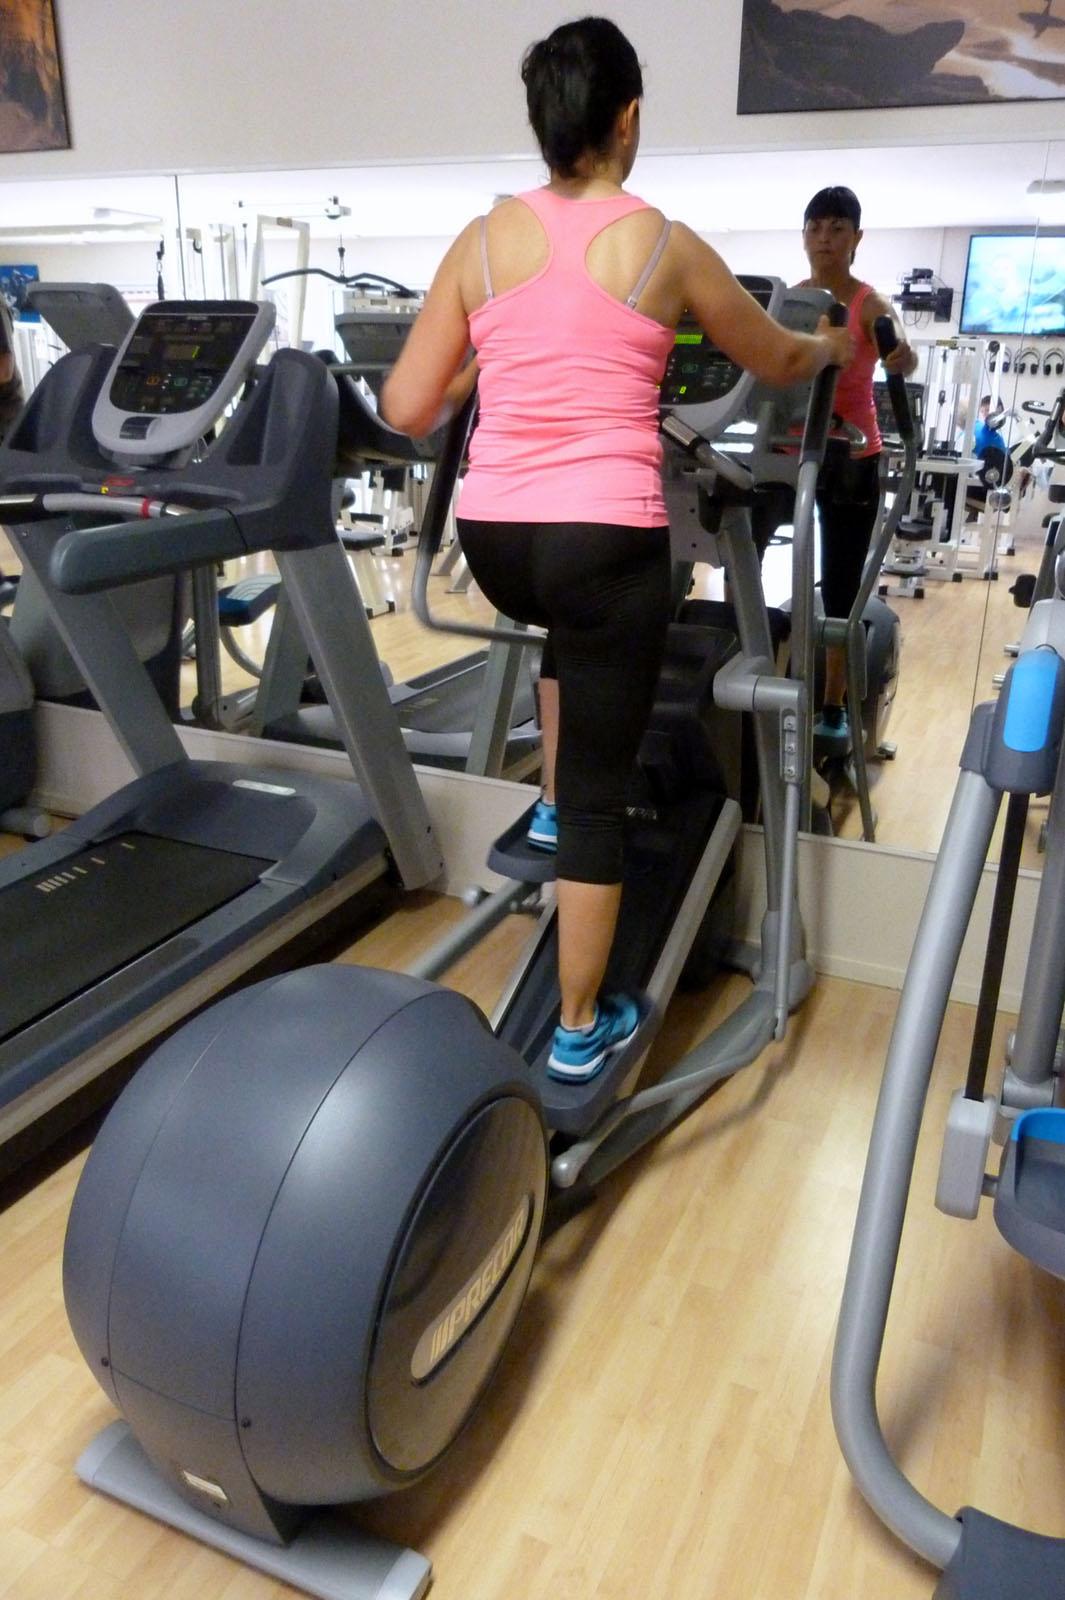 salle de sport bergerac Elliptique Fitness Crosstrainer EFX 835 CroosRamp Precor 3